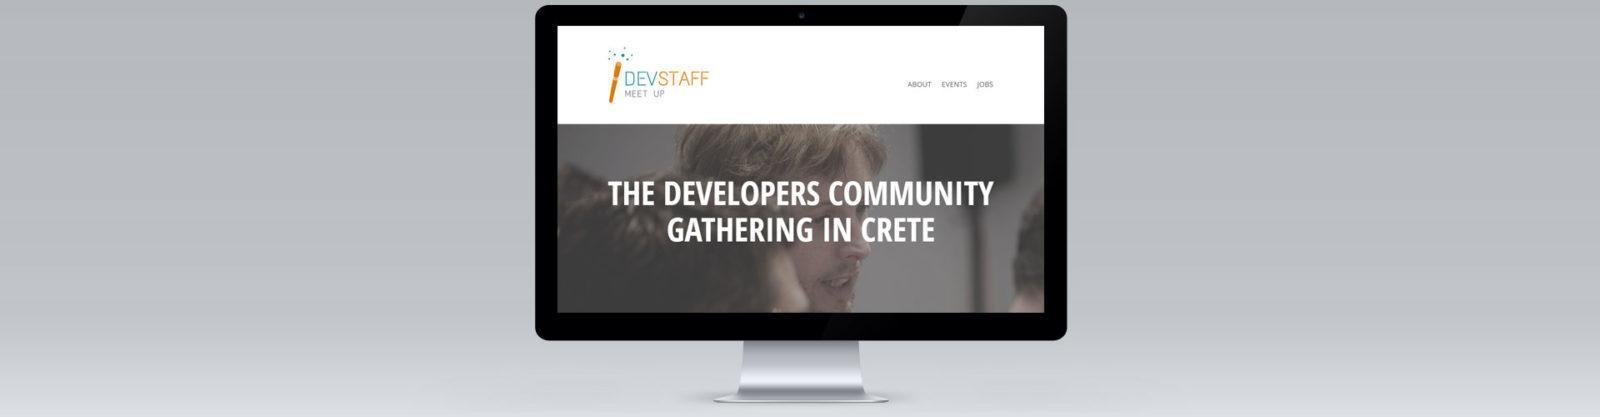 DevStaff Meetup   Javascript Frameworks   Office_12